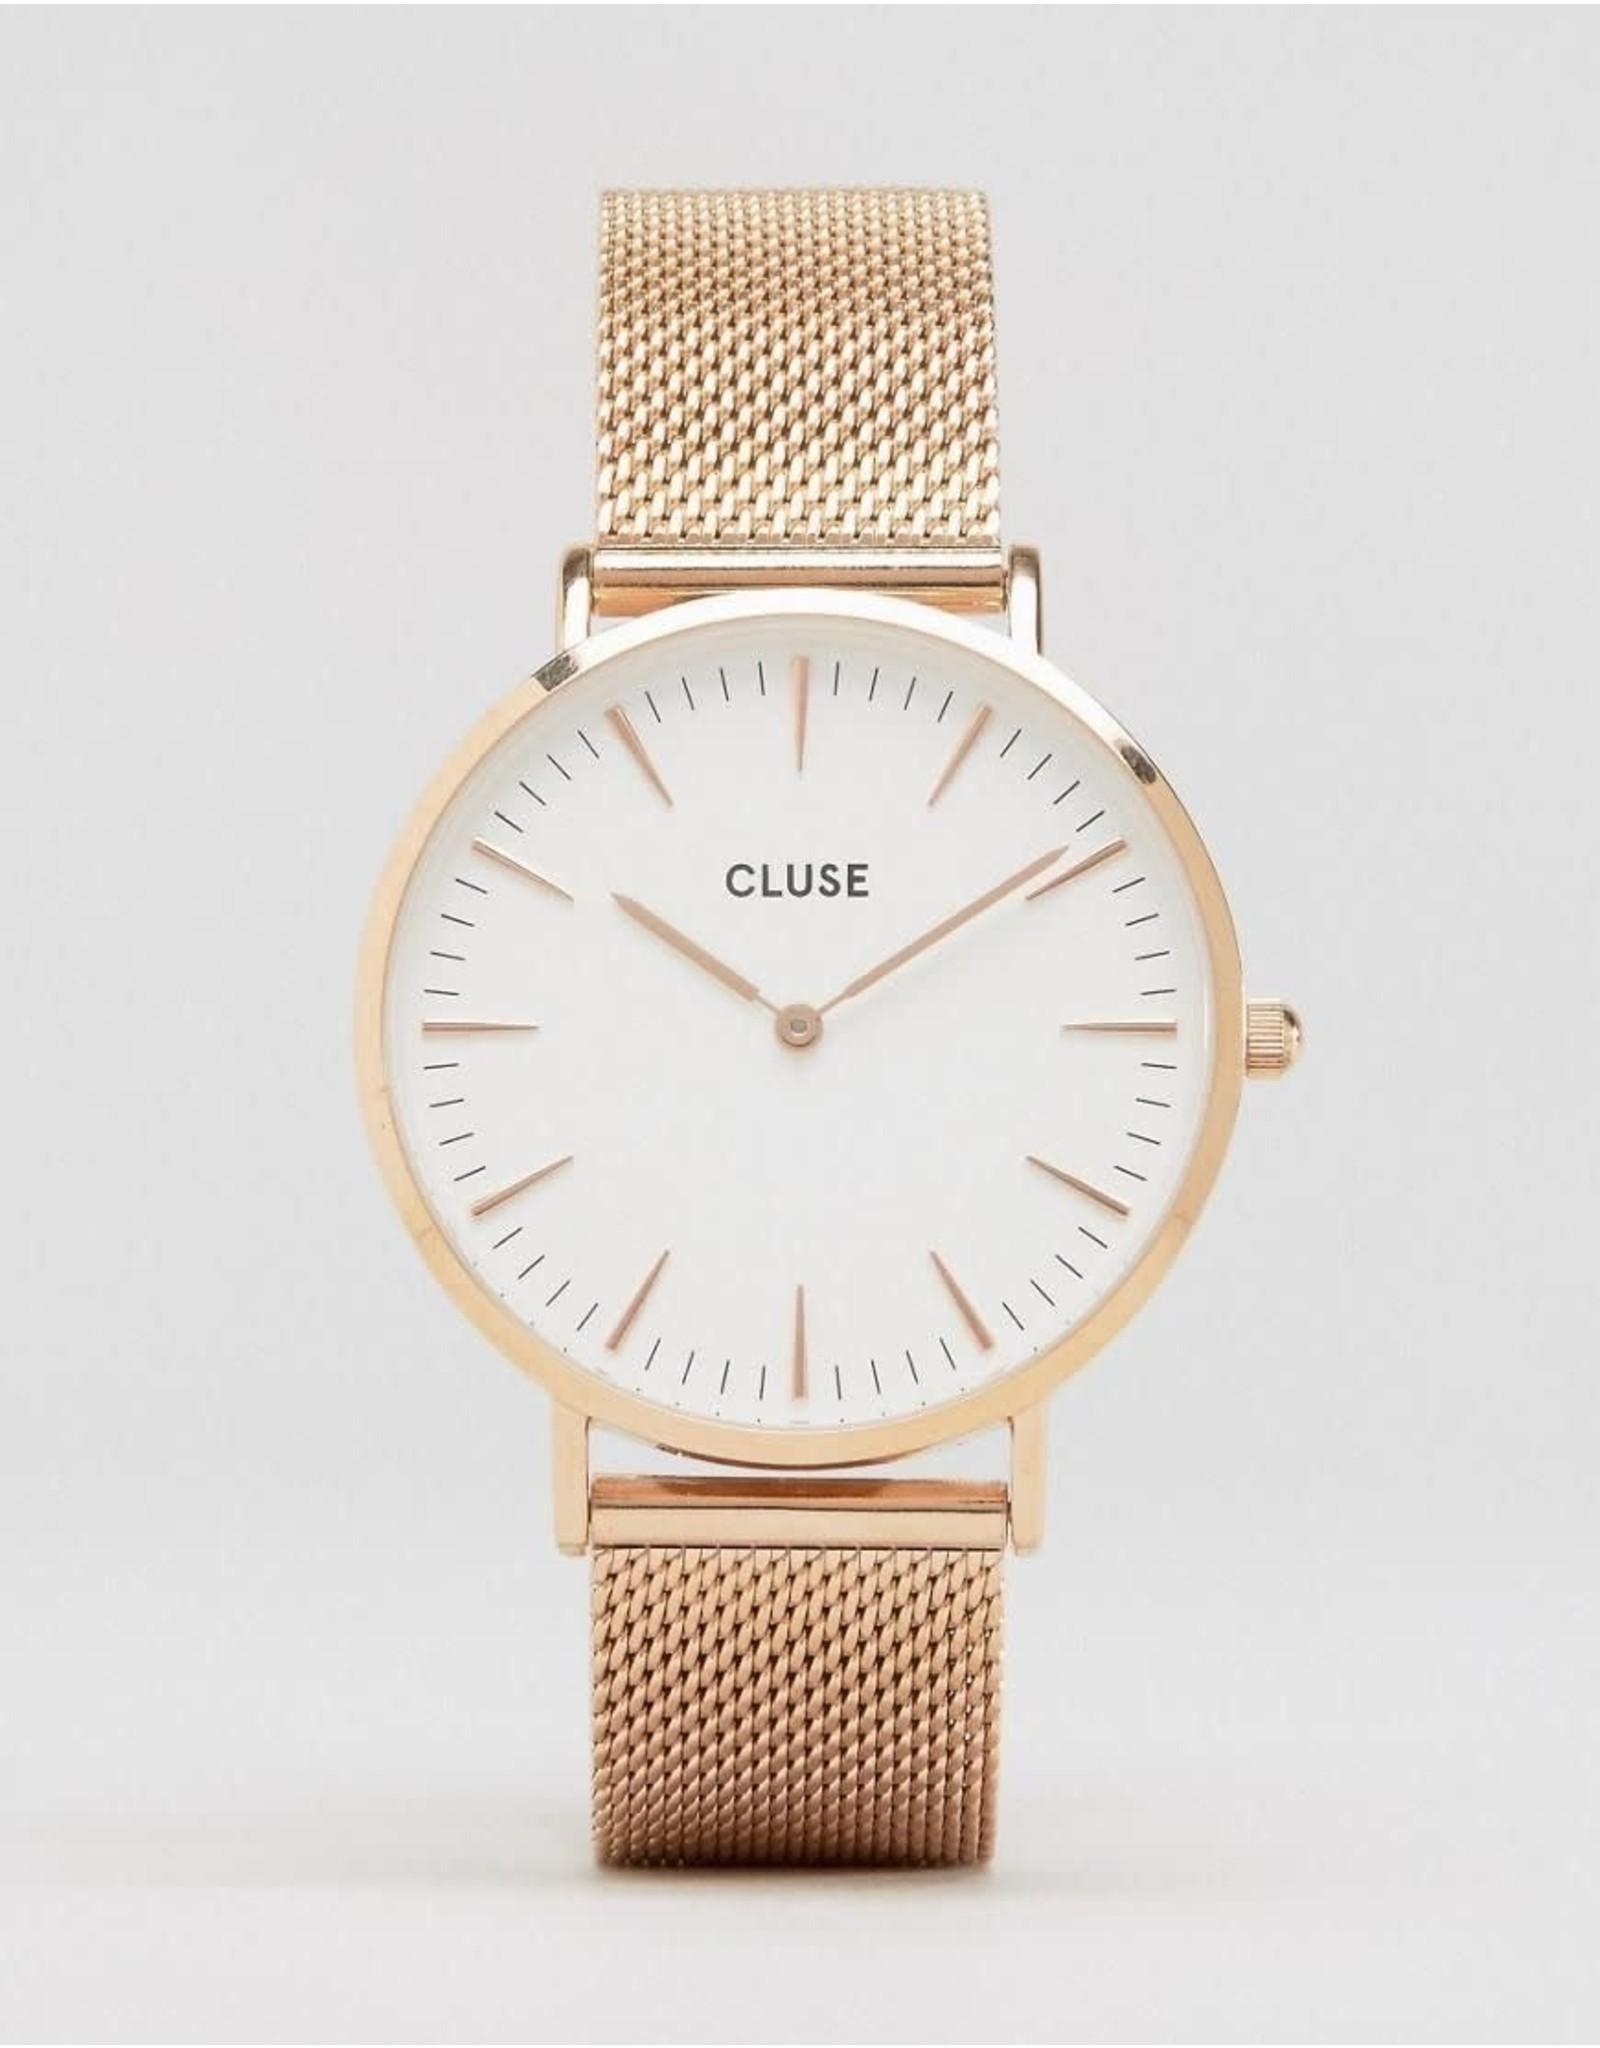 Cluse Cluse CL18112 La Bohème Staal Roos Mesh Band